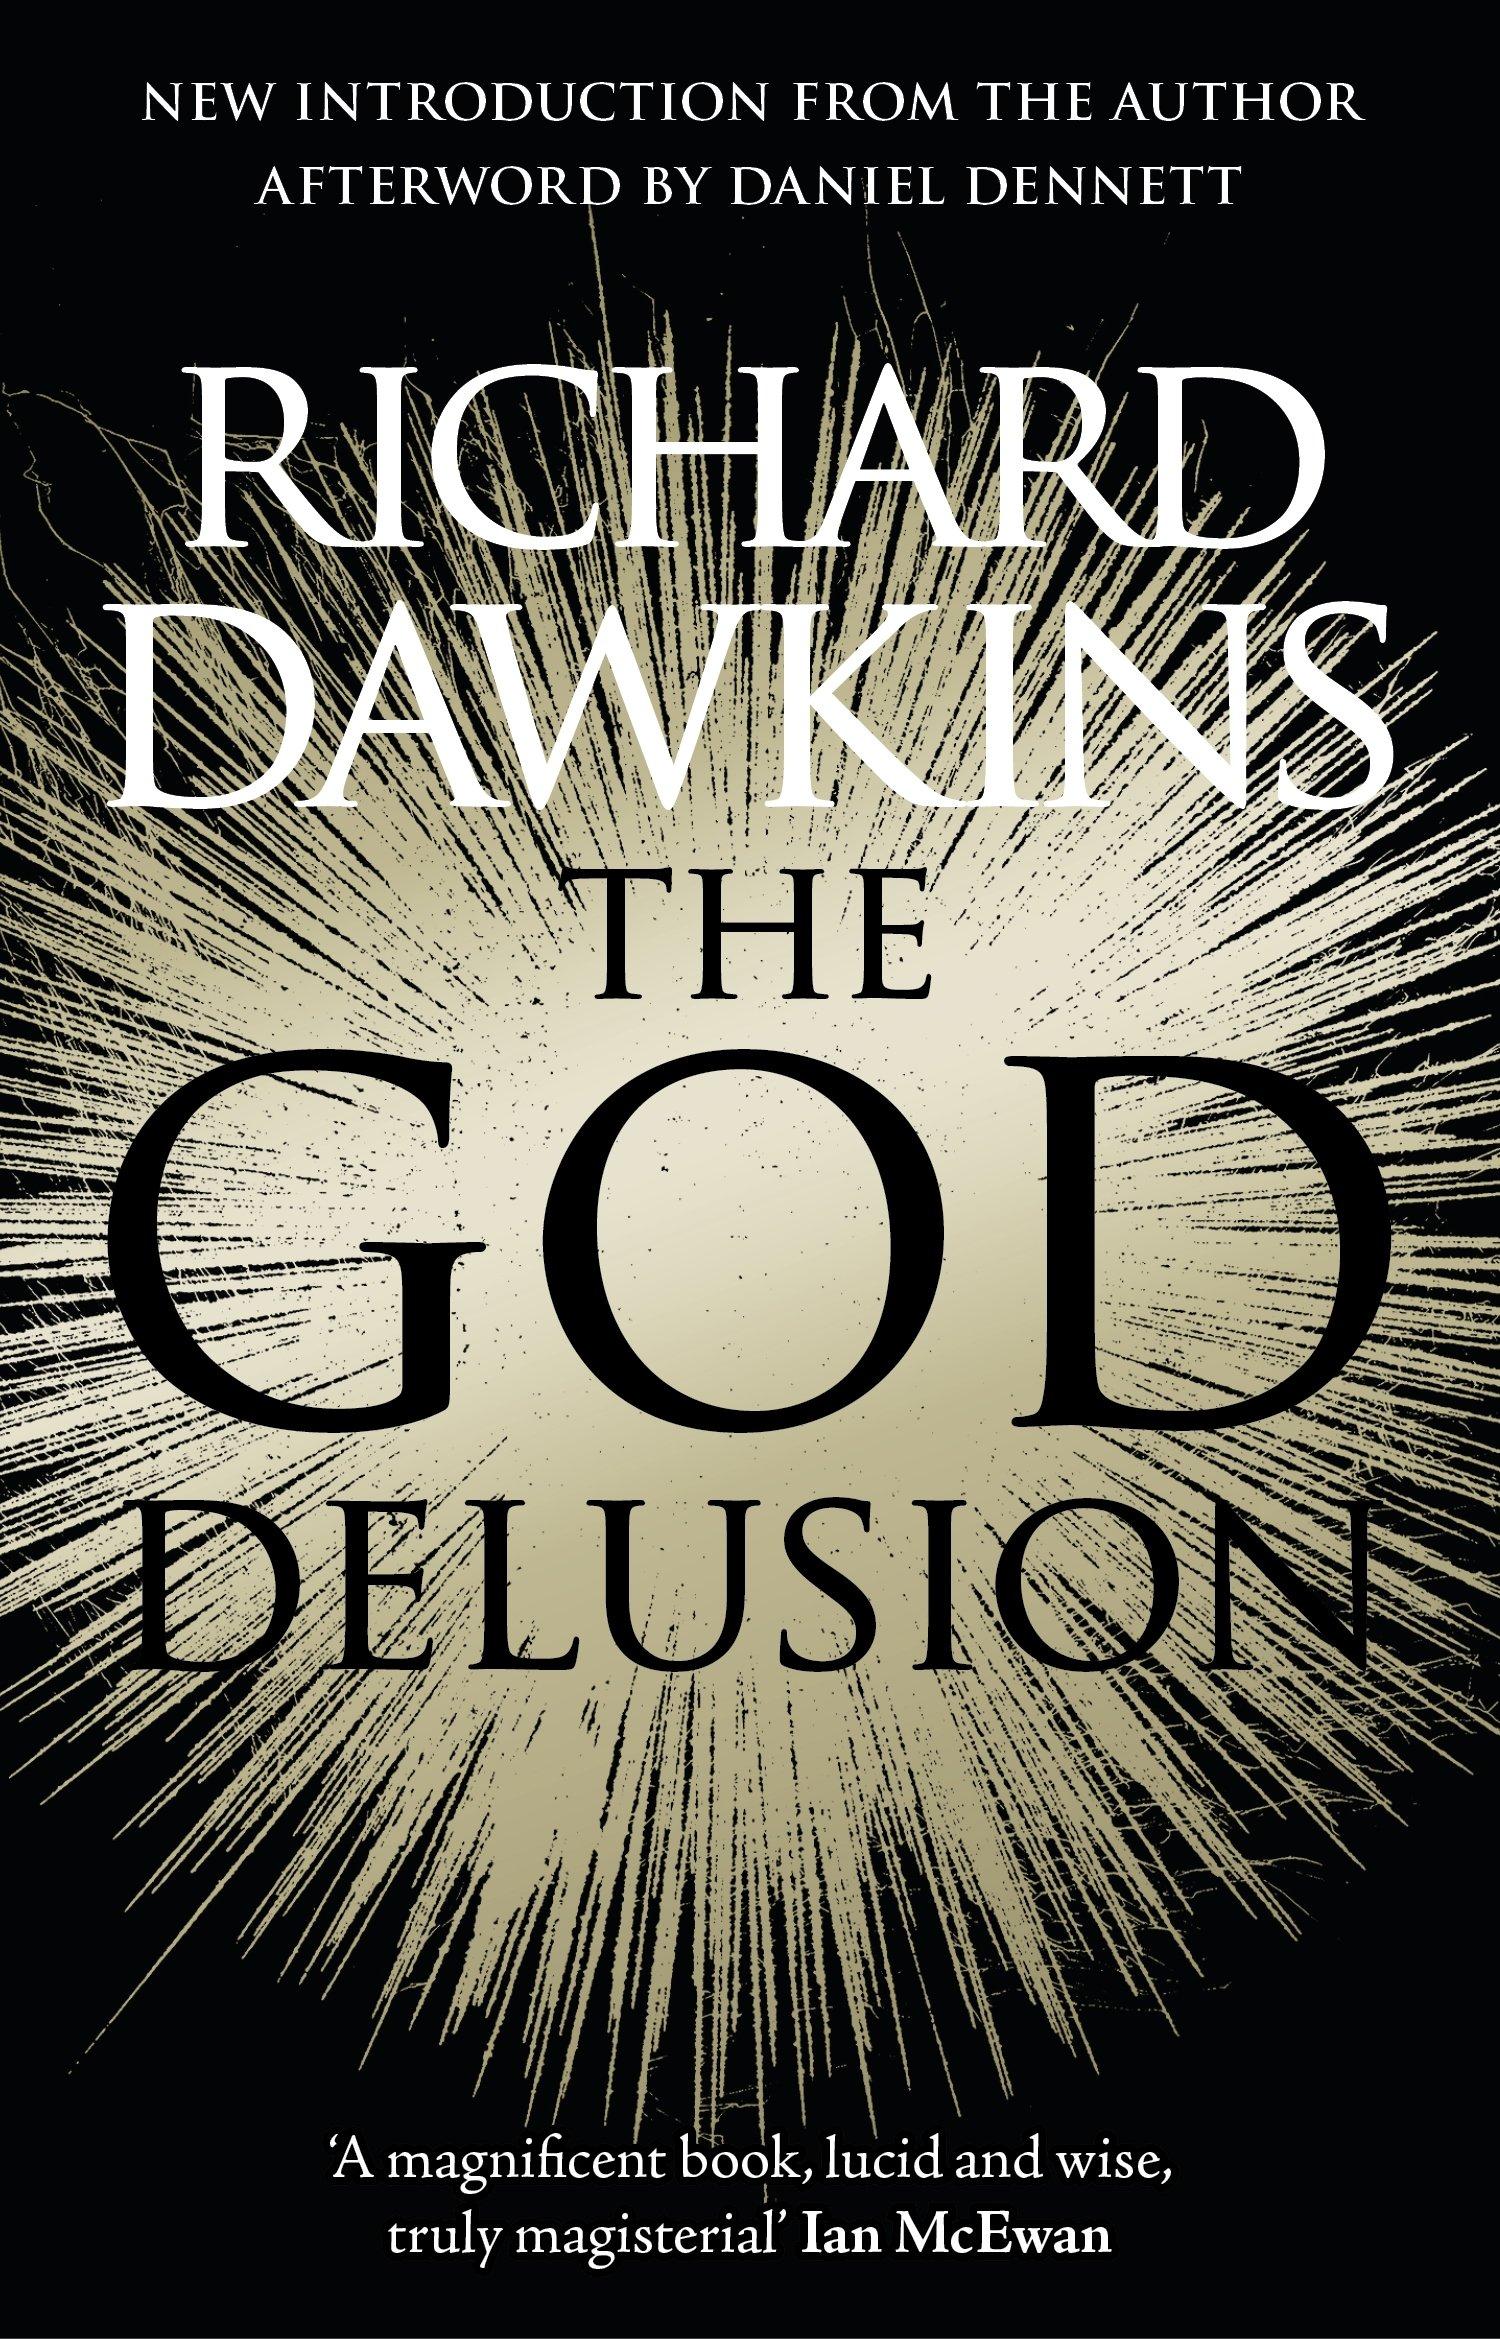 The God Delusion: 10th Anniversary Edition: Amazon.co.uk: Dawkins ...